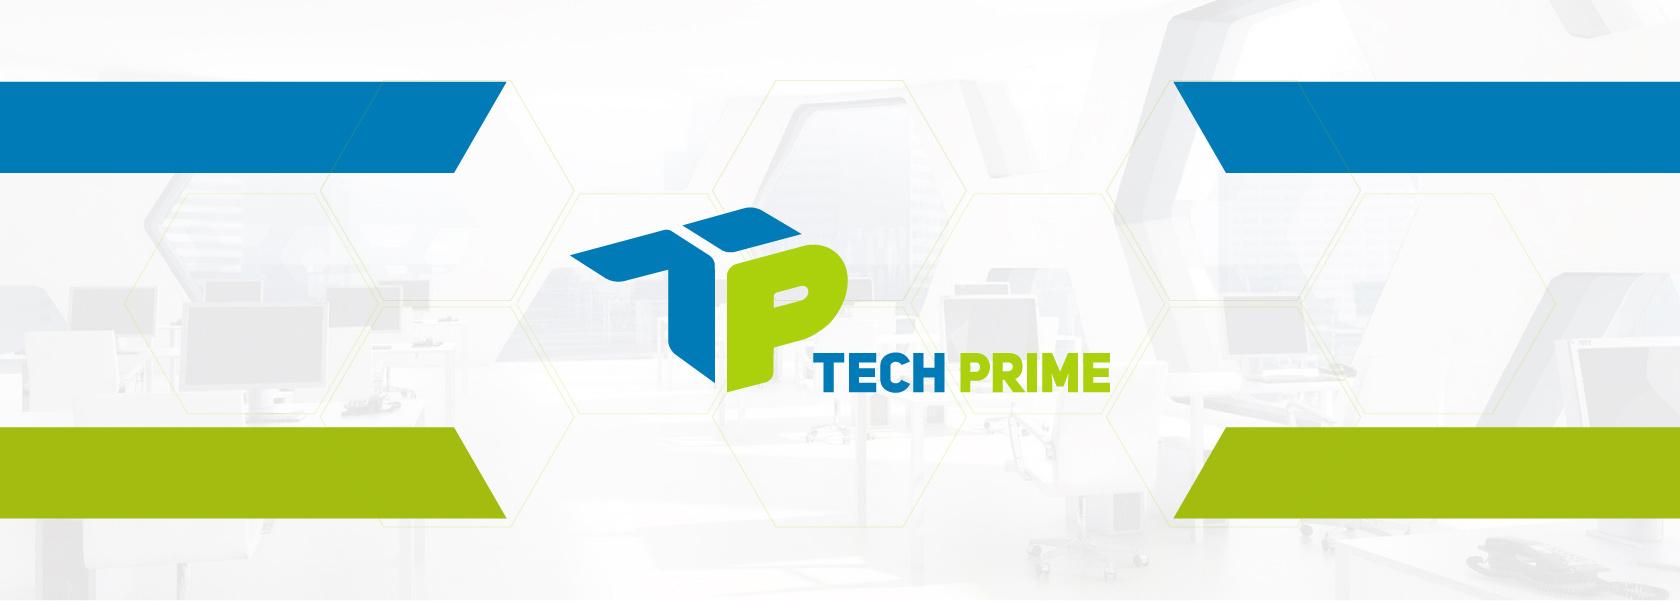 Tech Prime создание лого